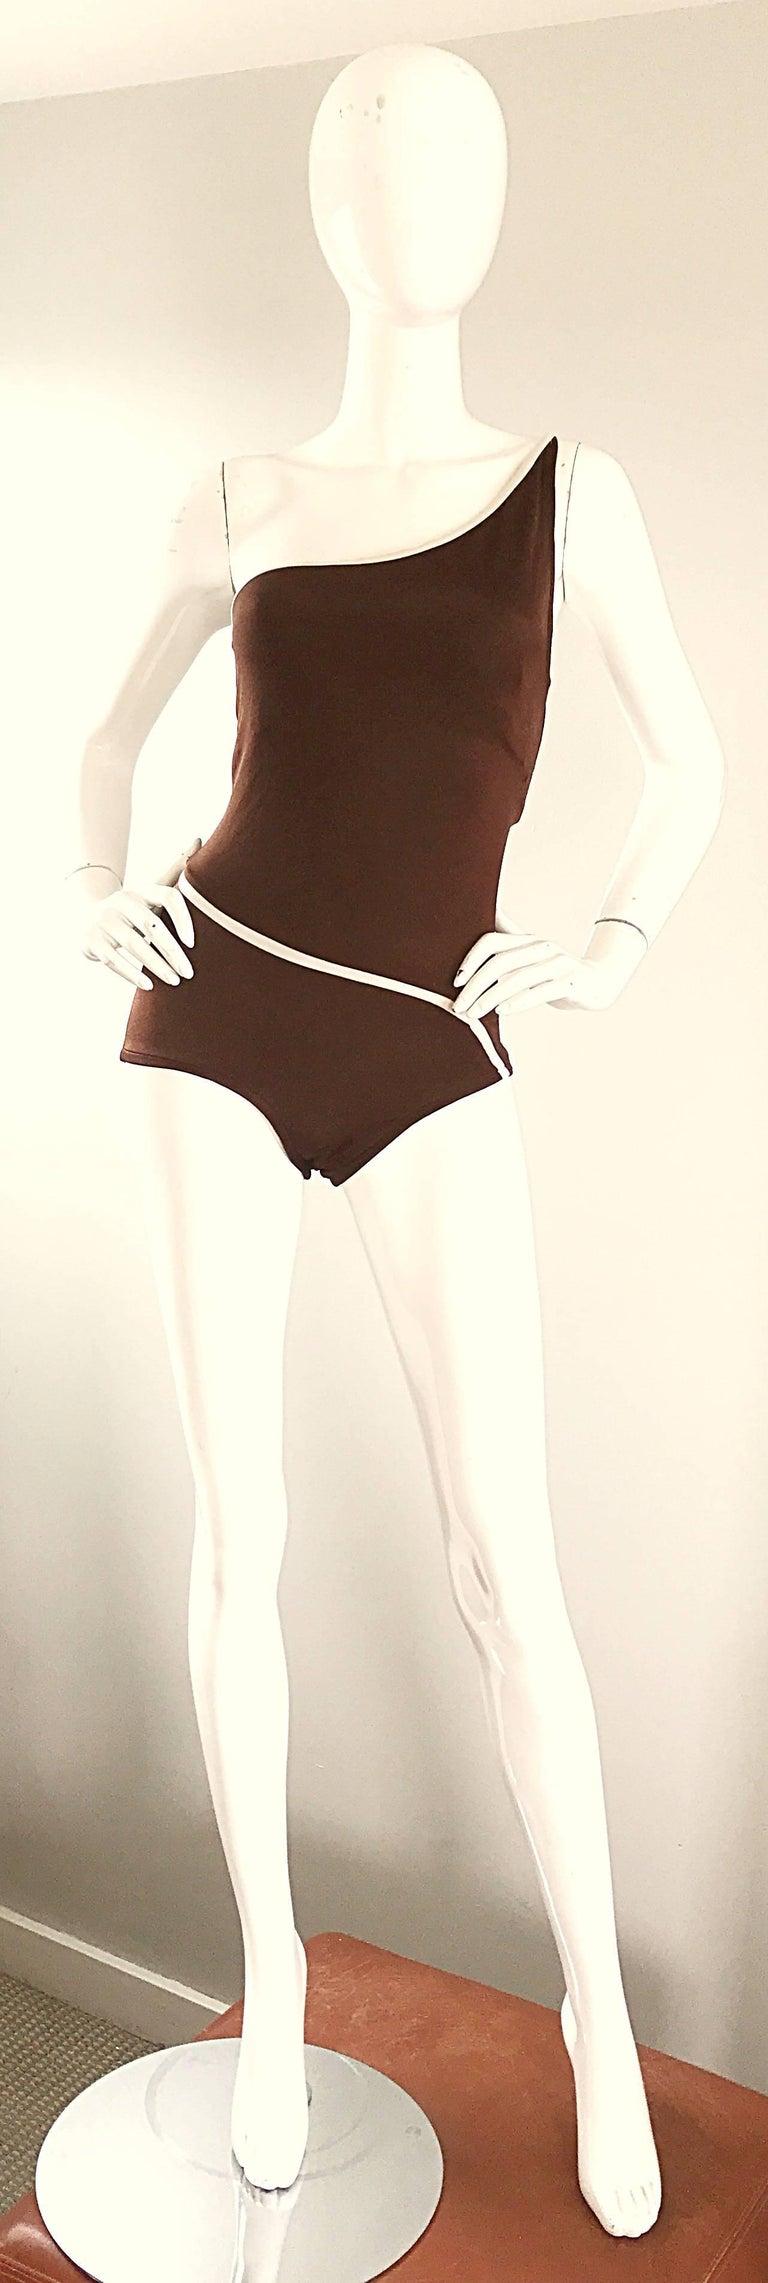 1970s Bill Blass Brown White One Shoulder Vintage One Piece Swimsuit Bodysuit For Sale 4